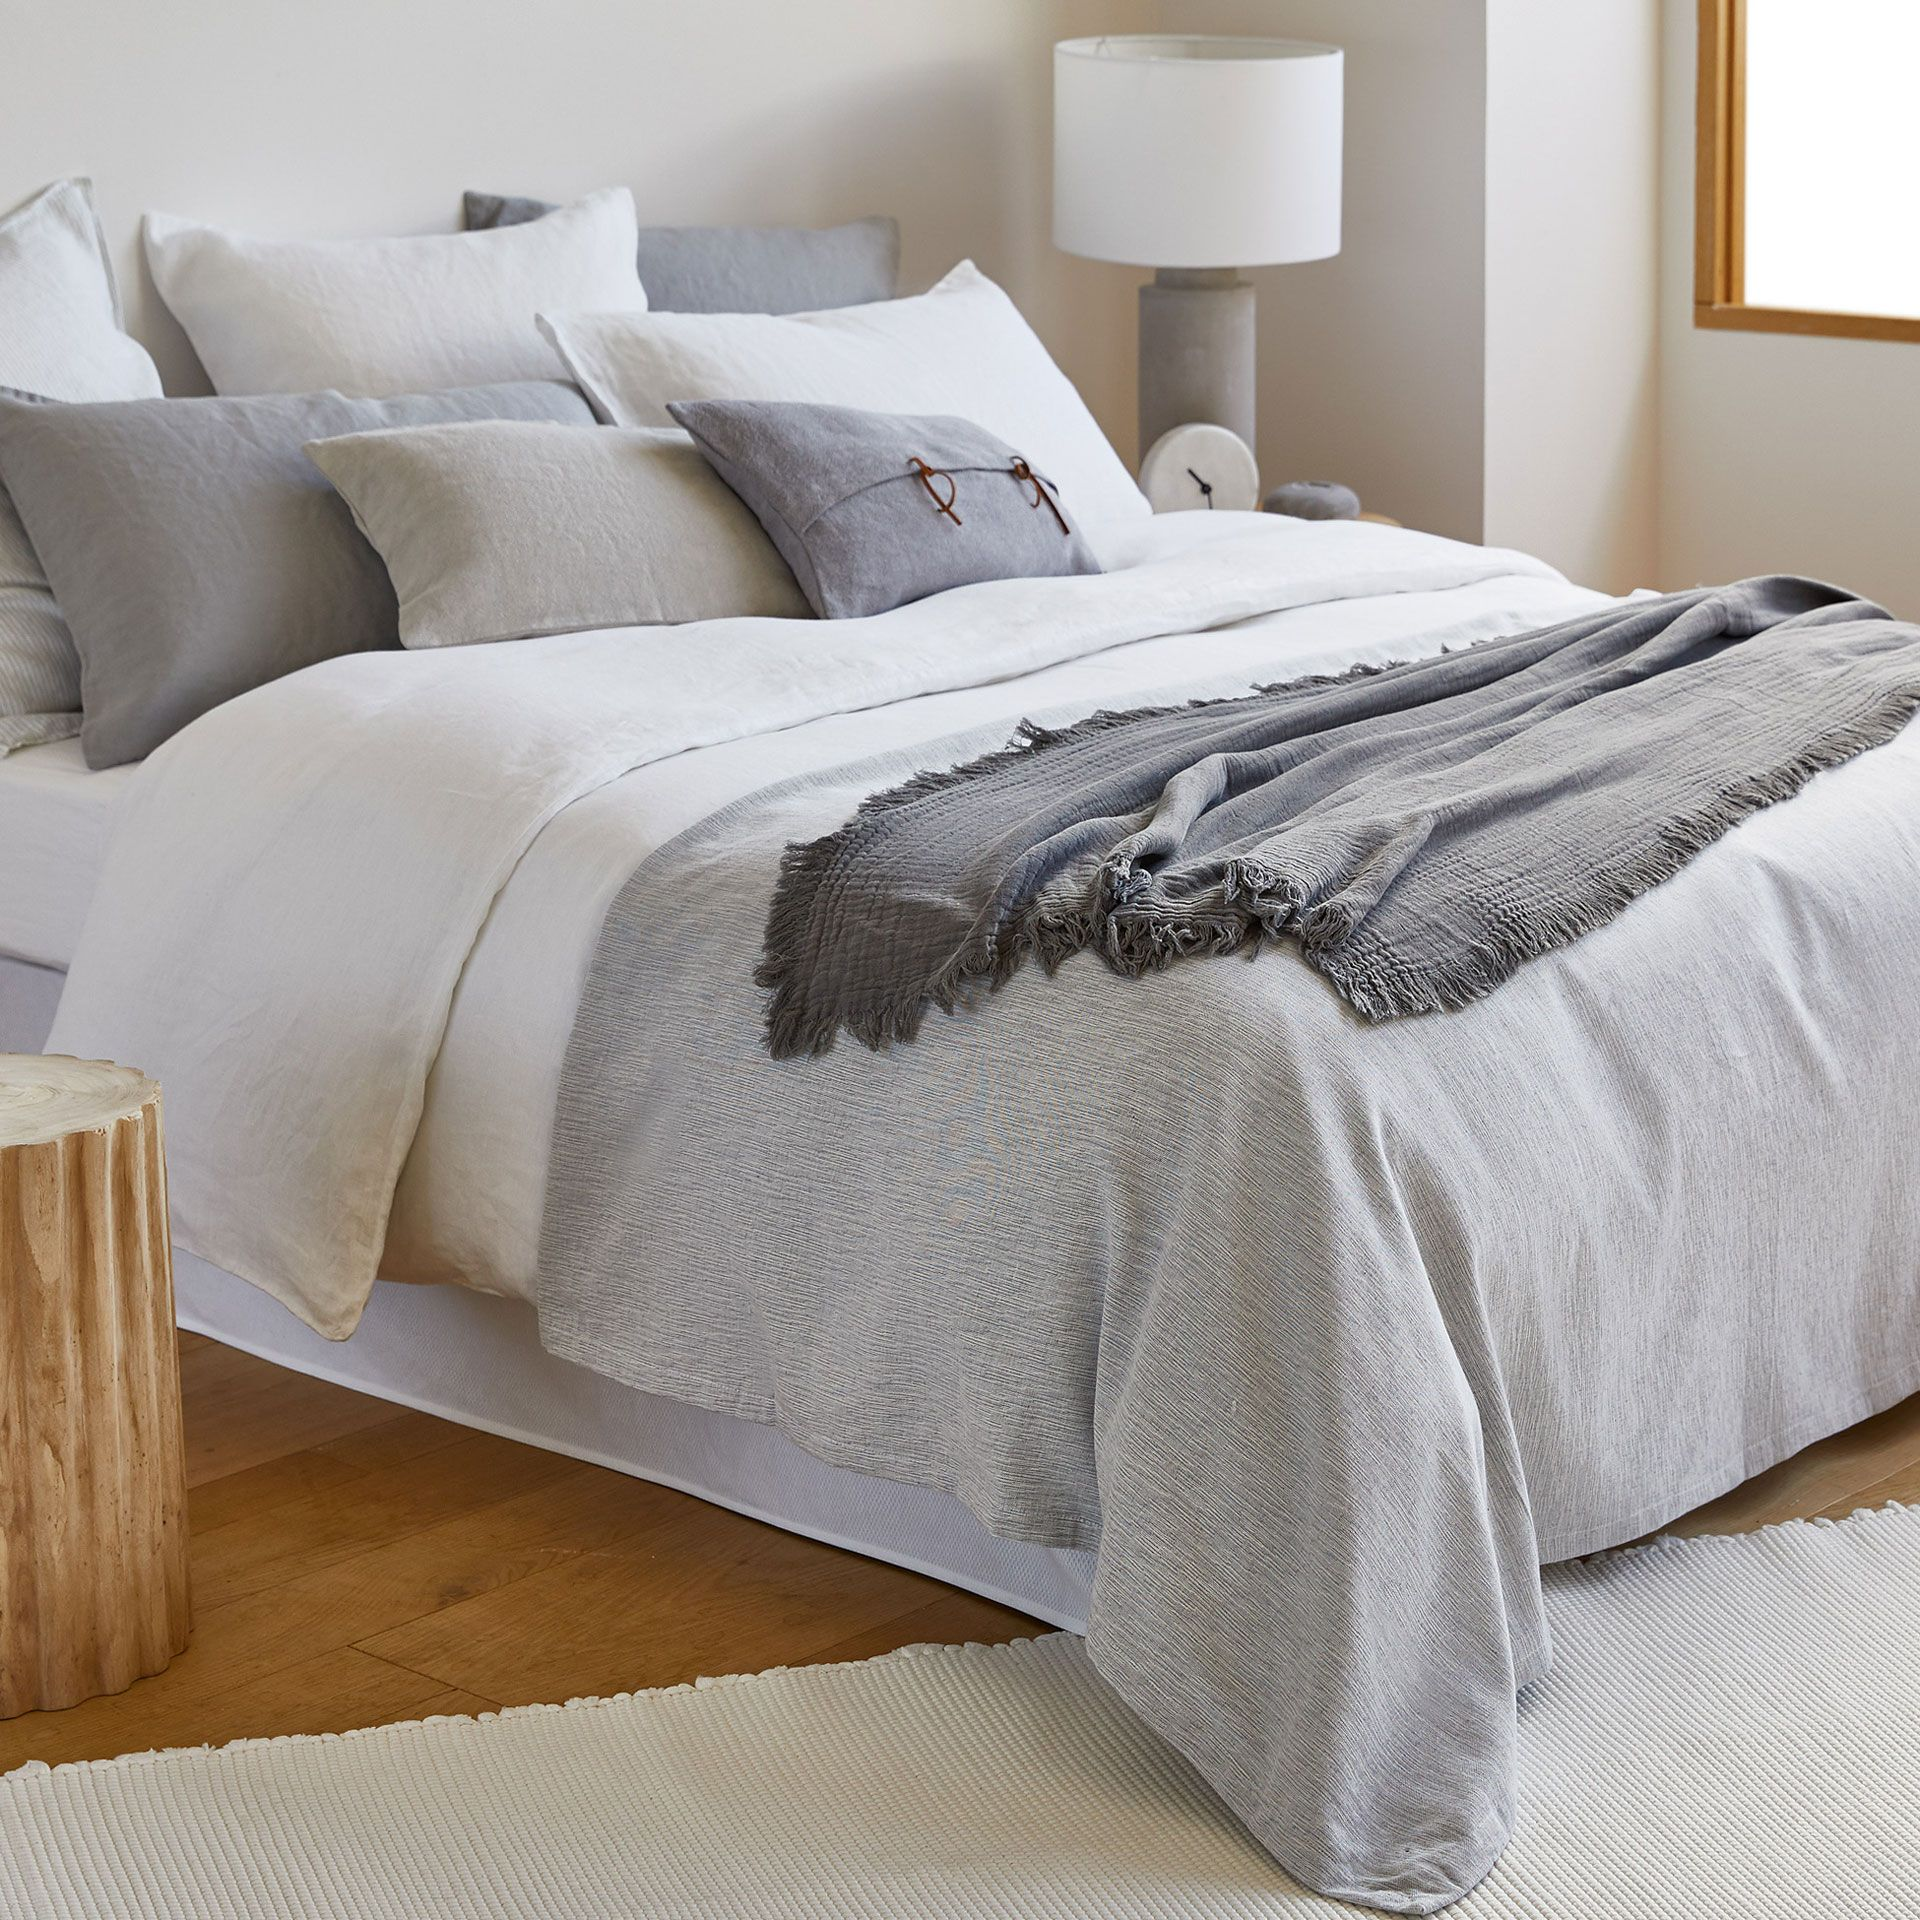 bedspread gray silver bedding quilt grey quilted velvet